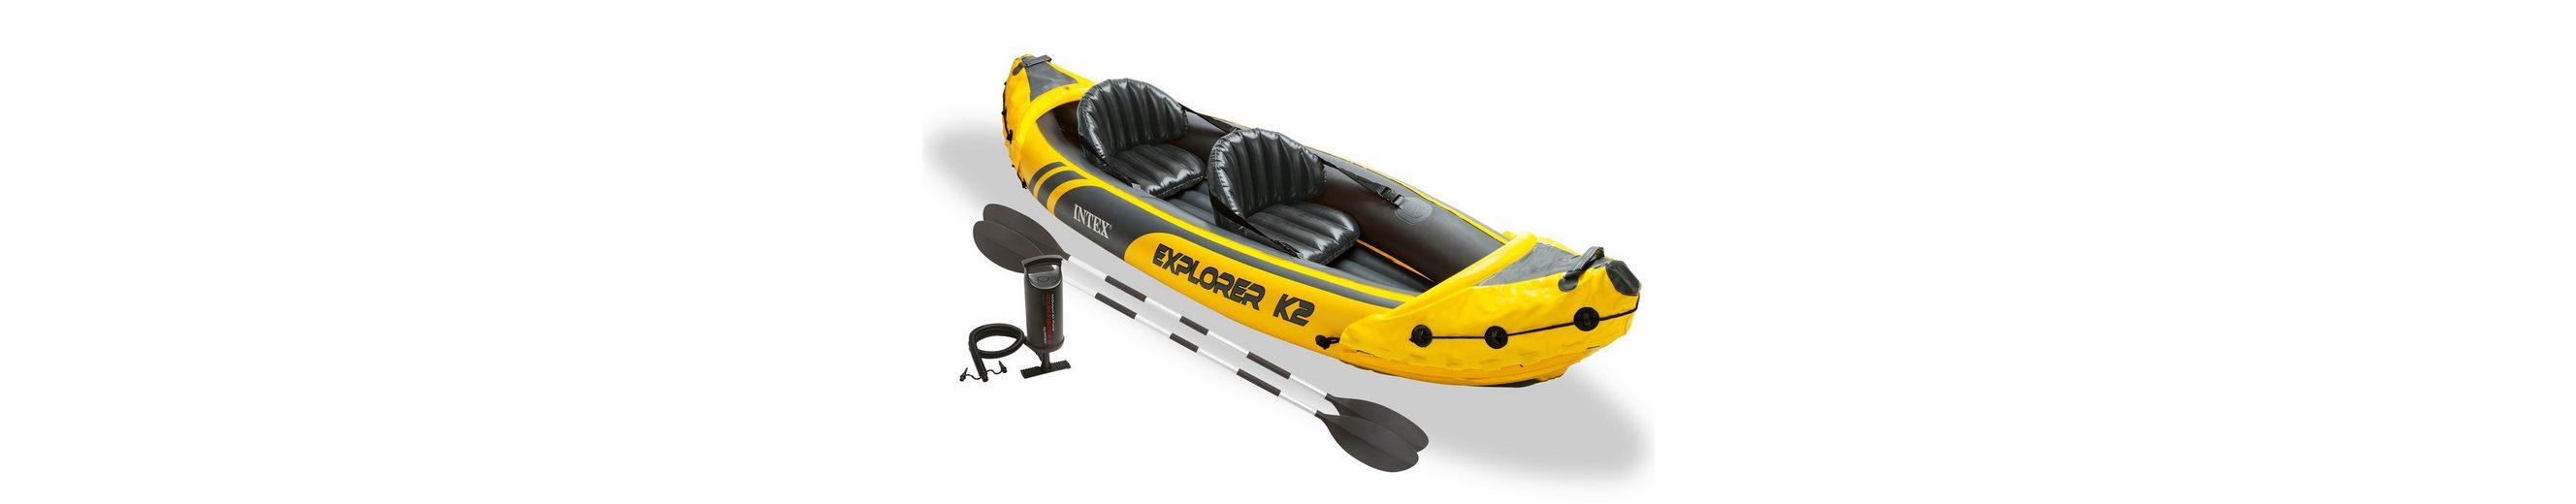 Kajak, »Explorer K2 Set«, Intex